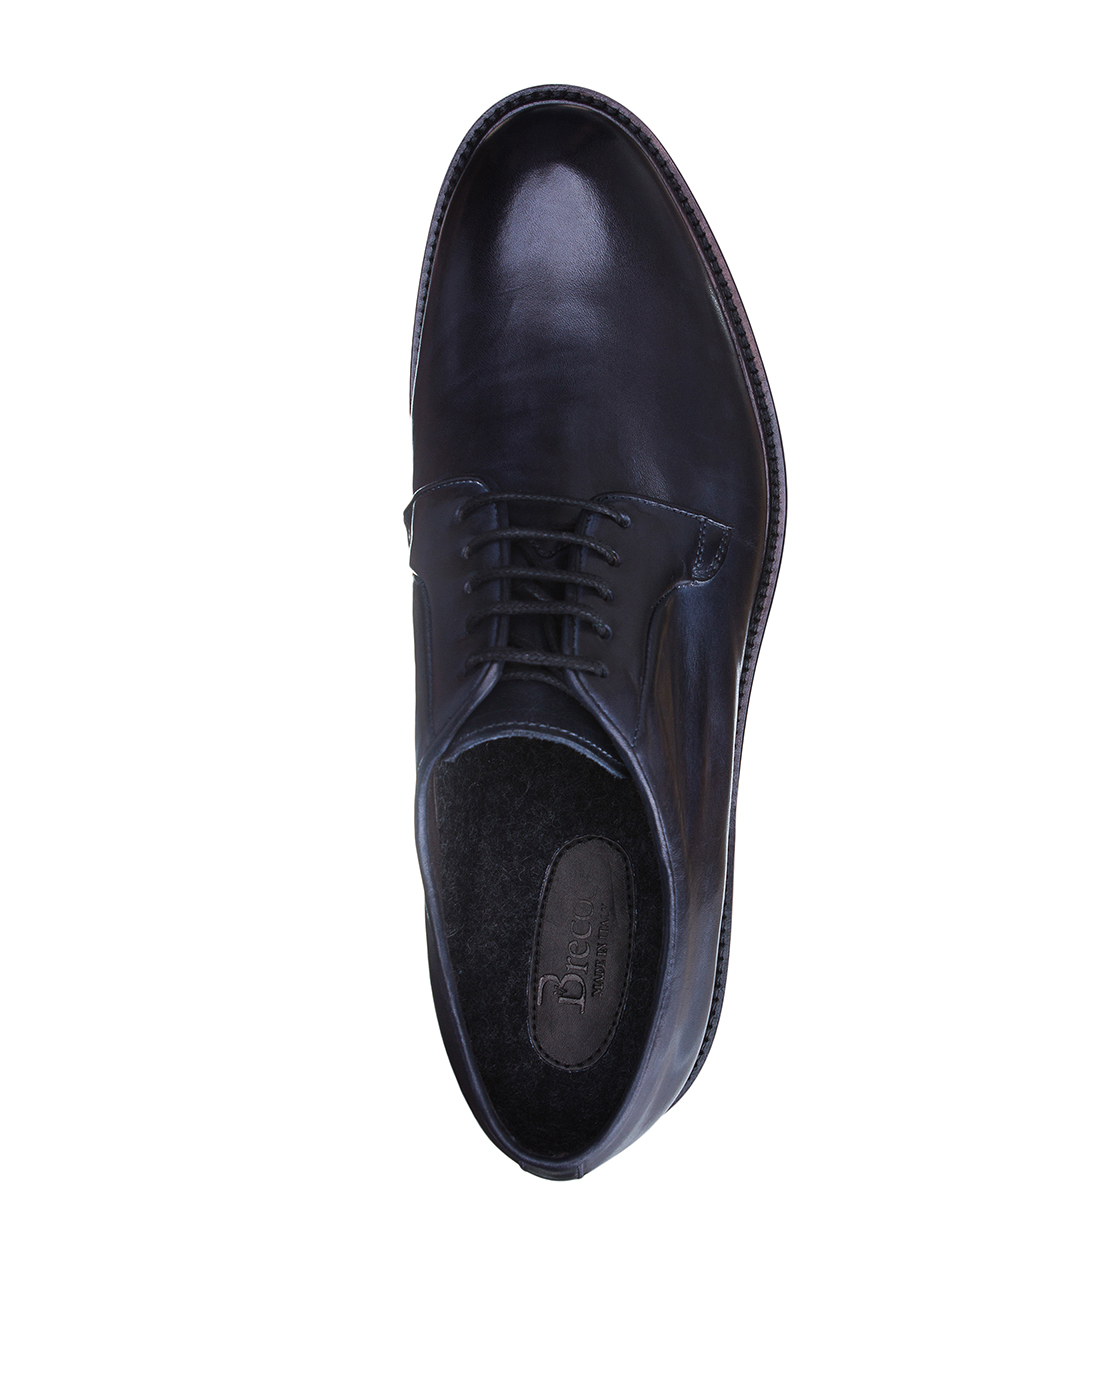 Туфли синие мужские Brecos S8066-5